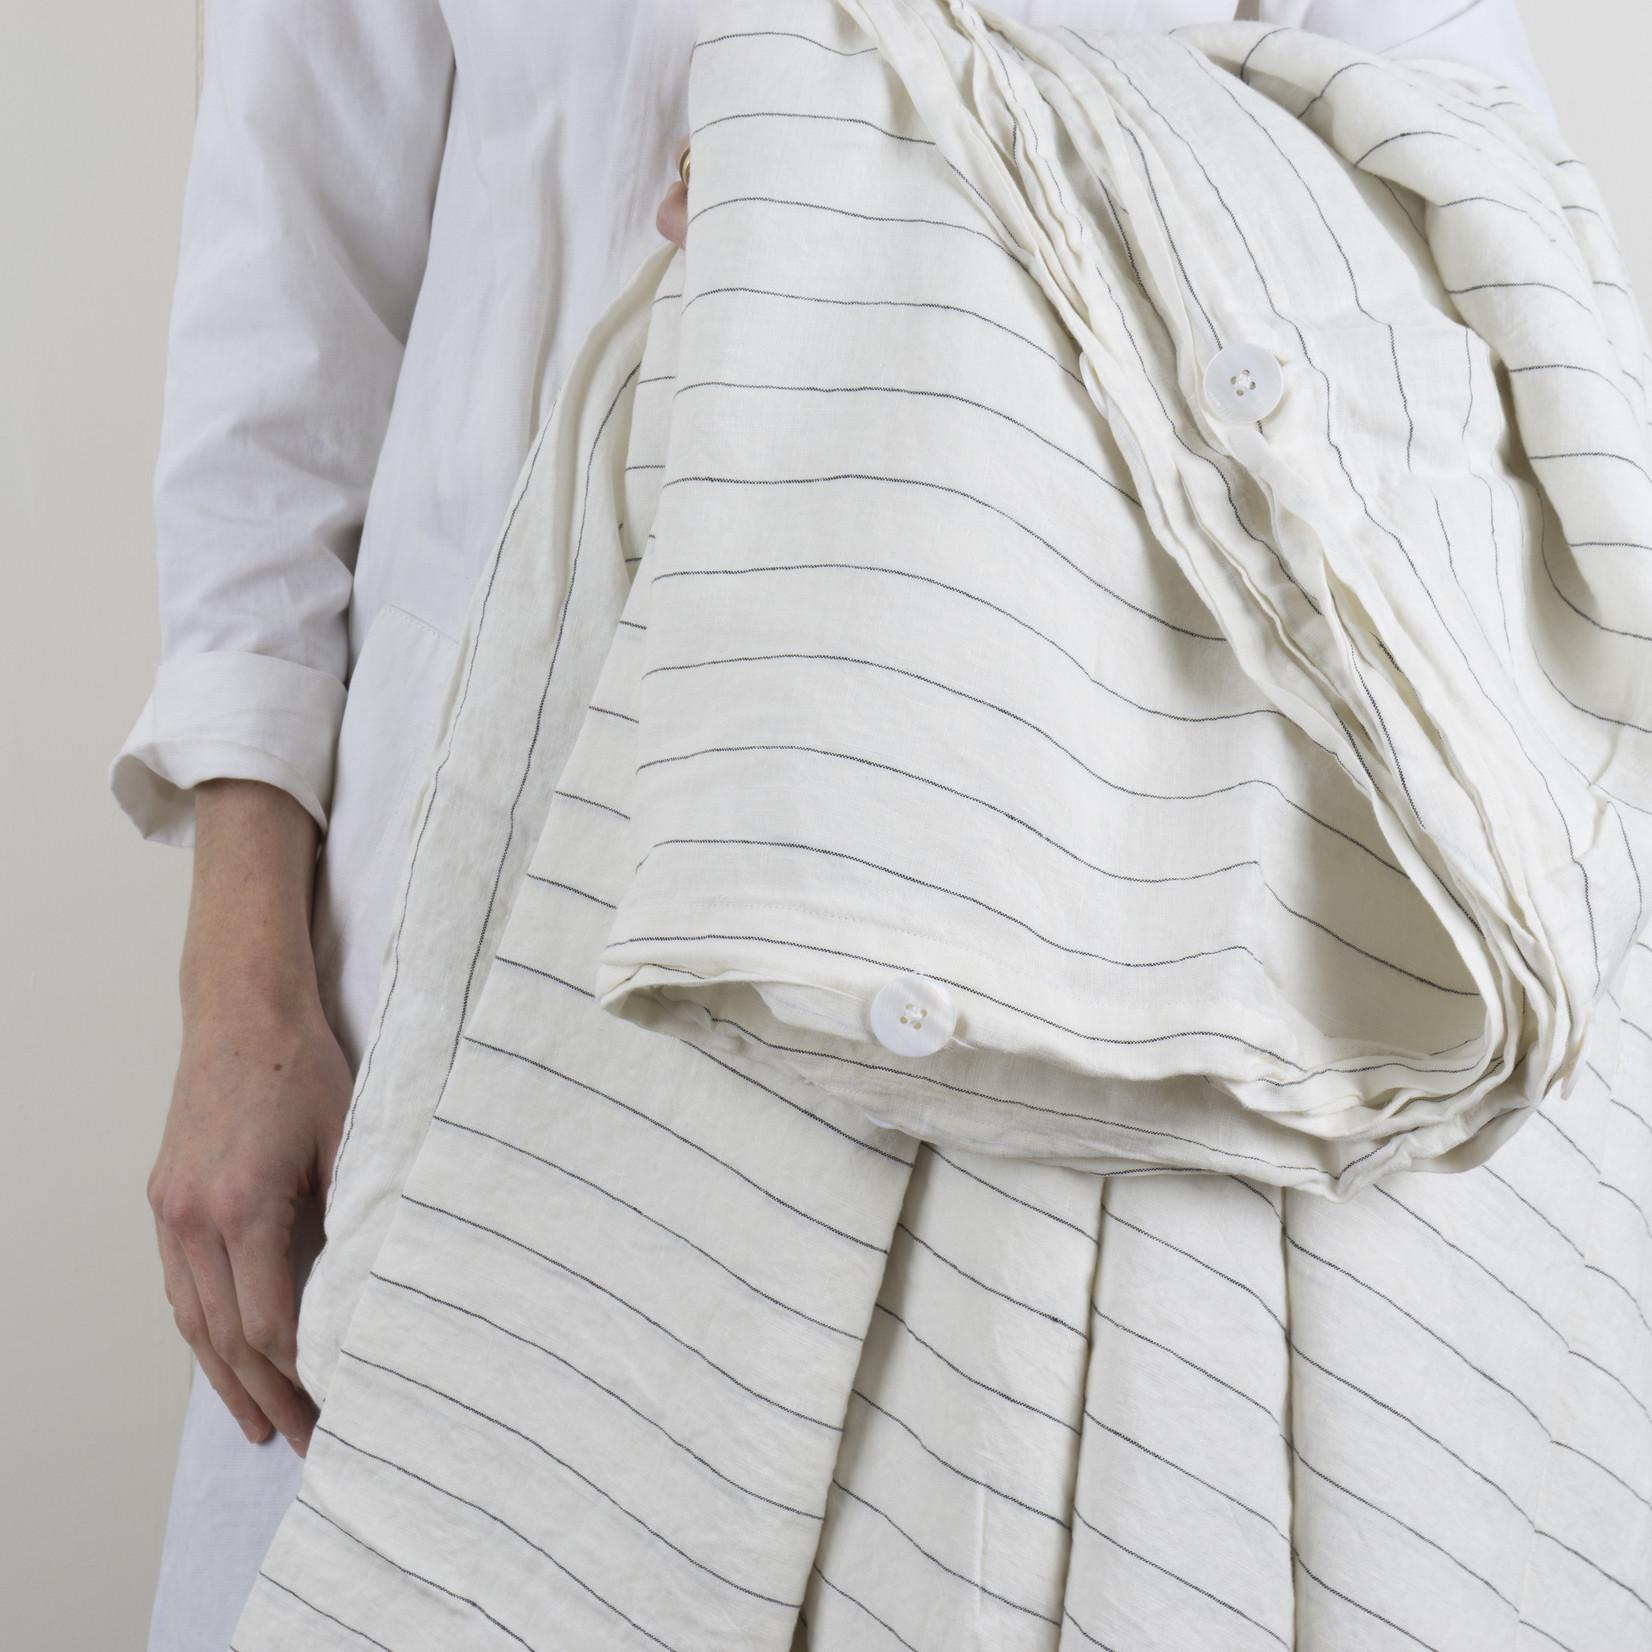 Linen Duvet Cover - Queen - Pencil Stripe